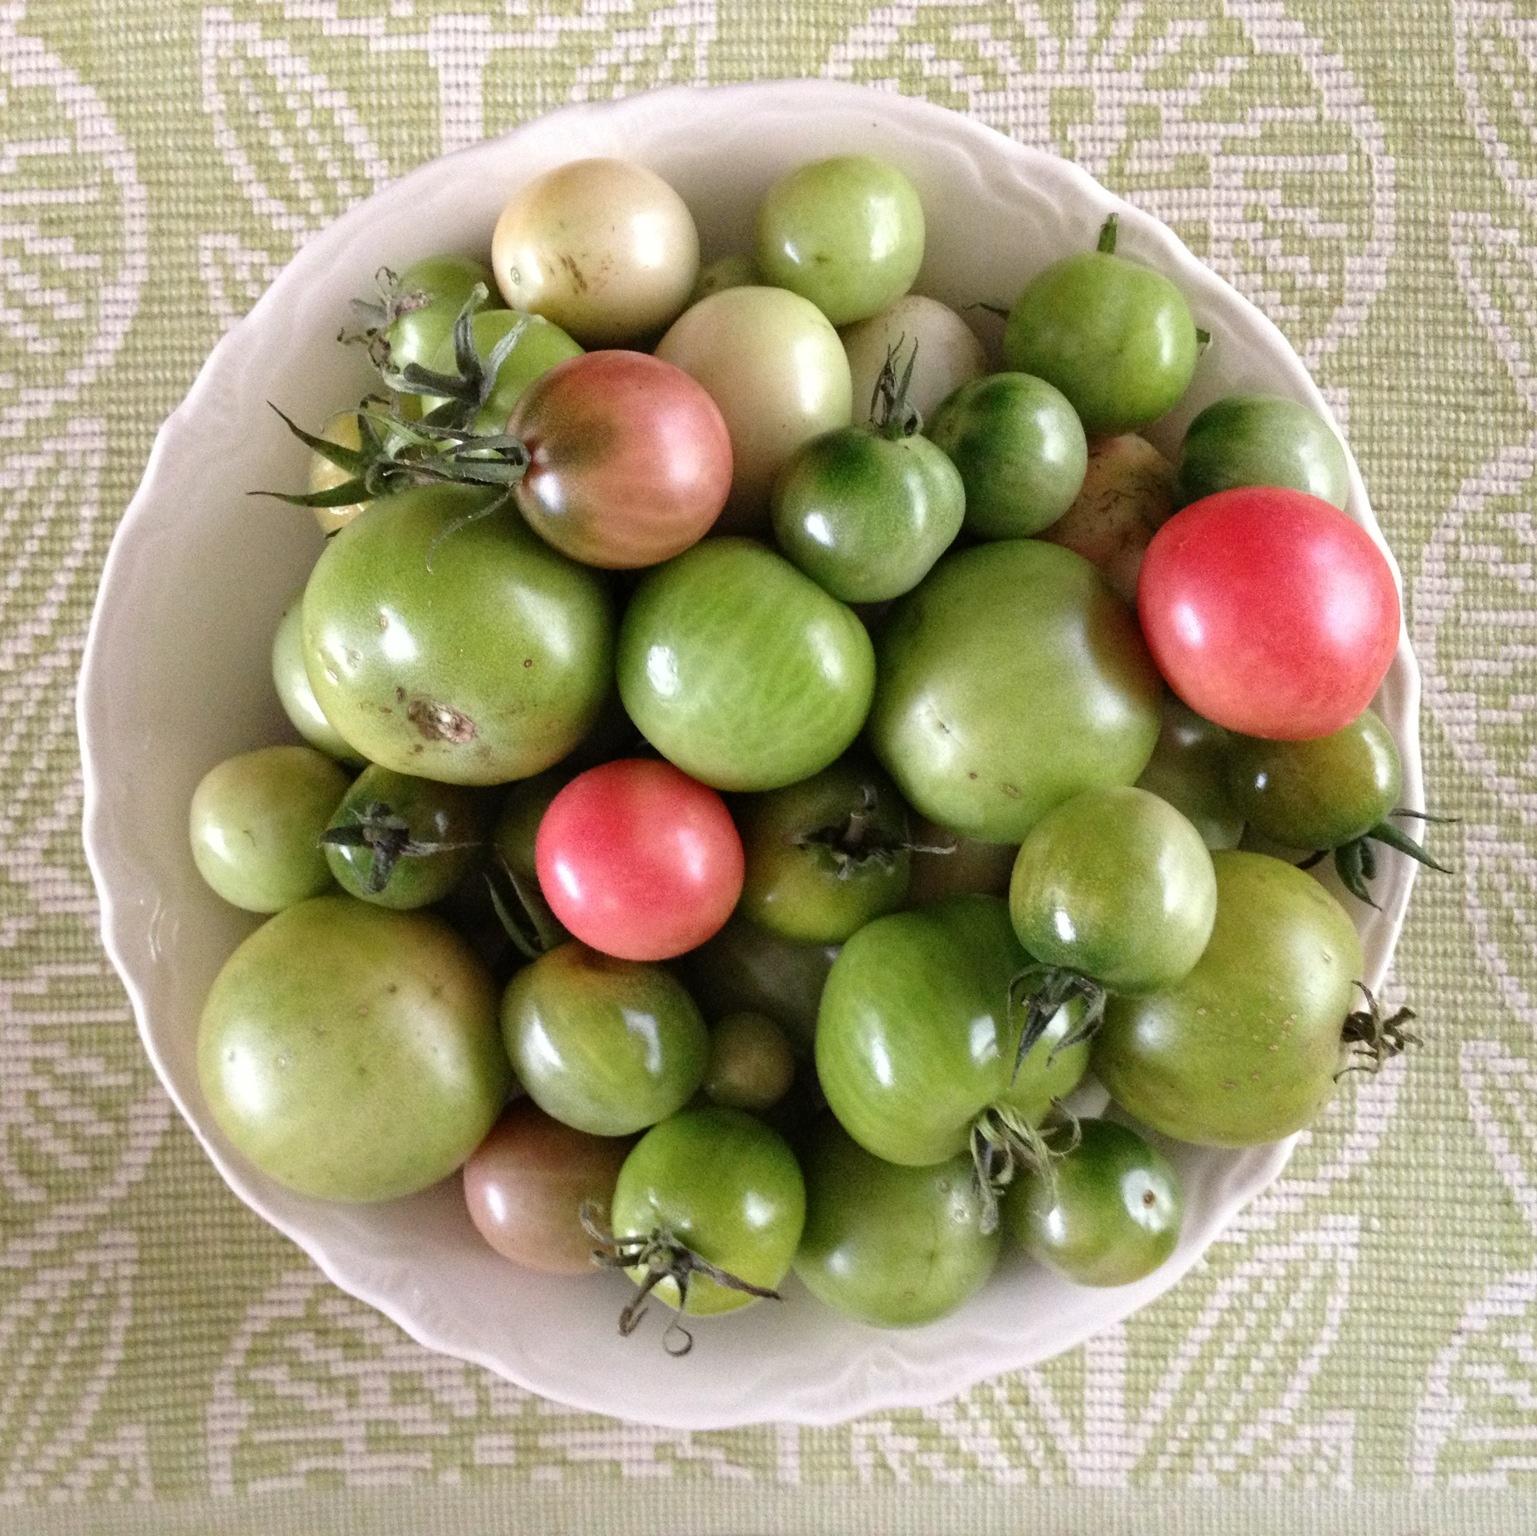 http://www.rubbercowgirl.com/2012/10/green-tomato-salsa.html